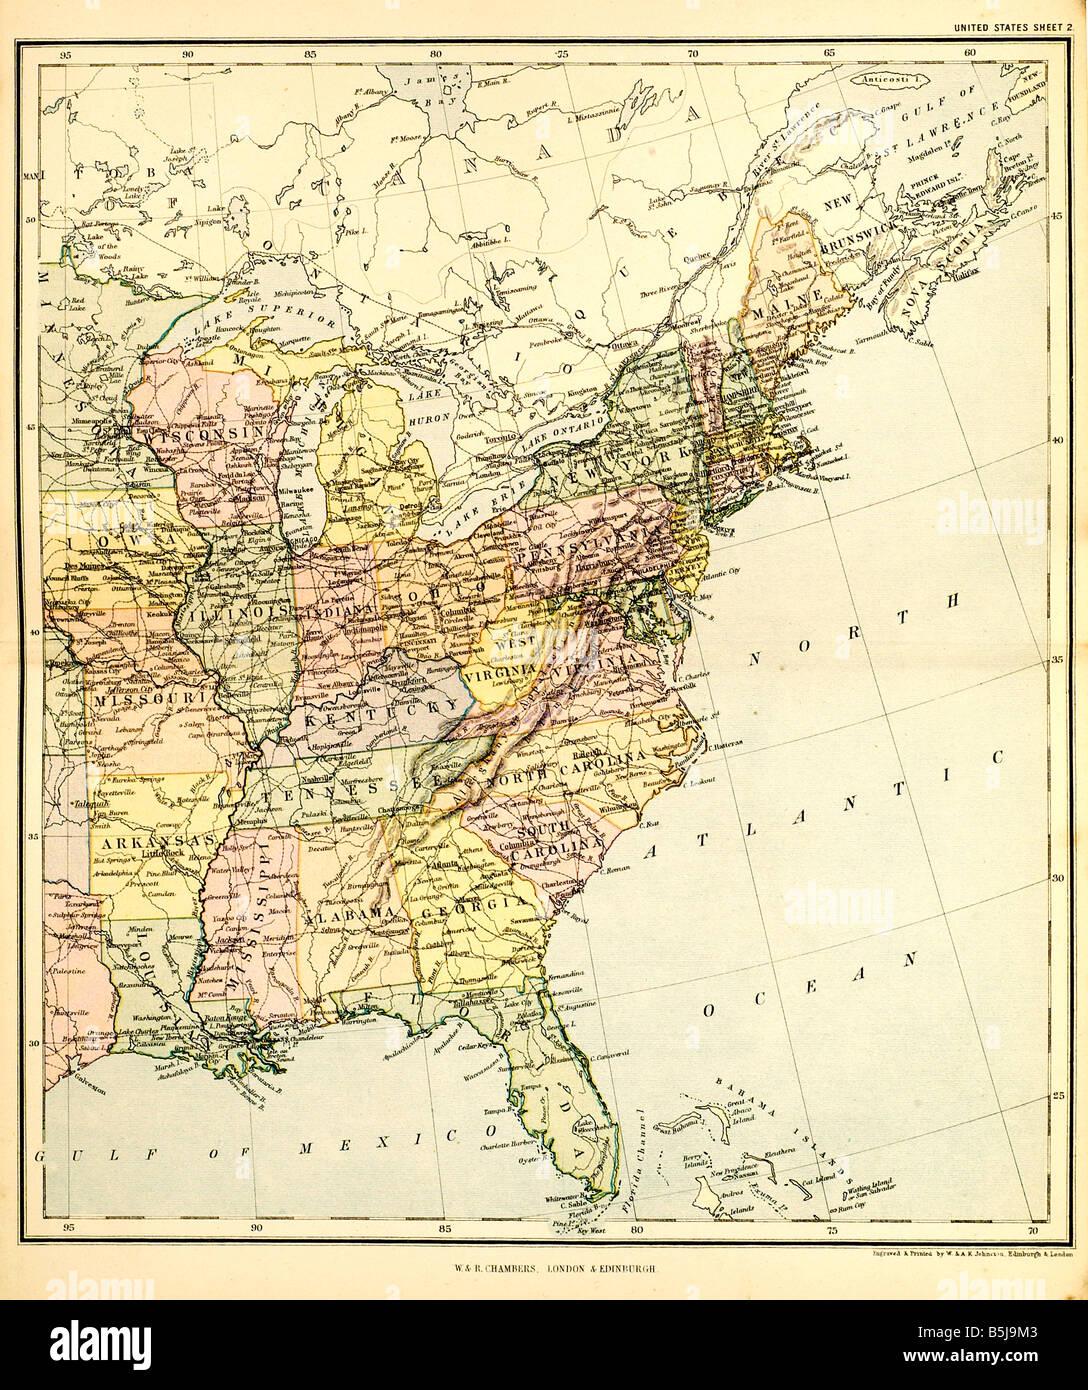 united states east map Eastern Seaboard Atlantic Ocean Washington ...